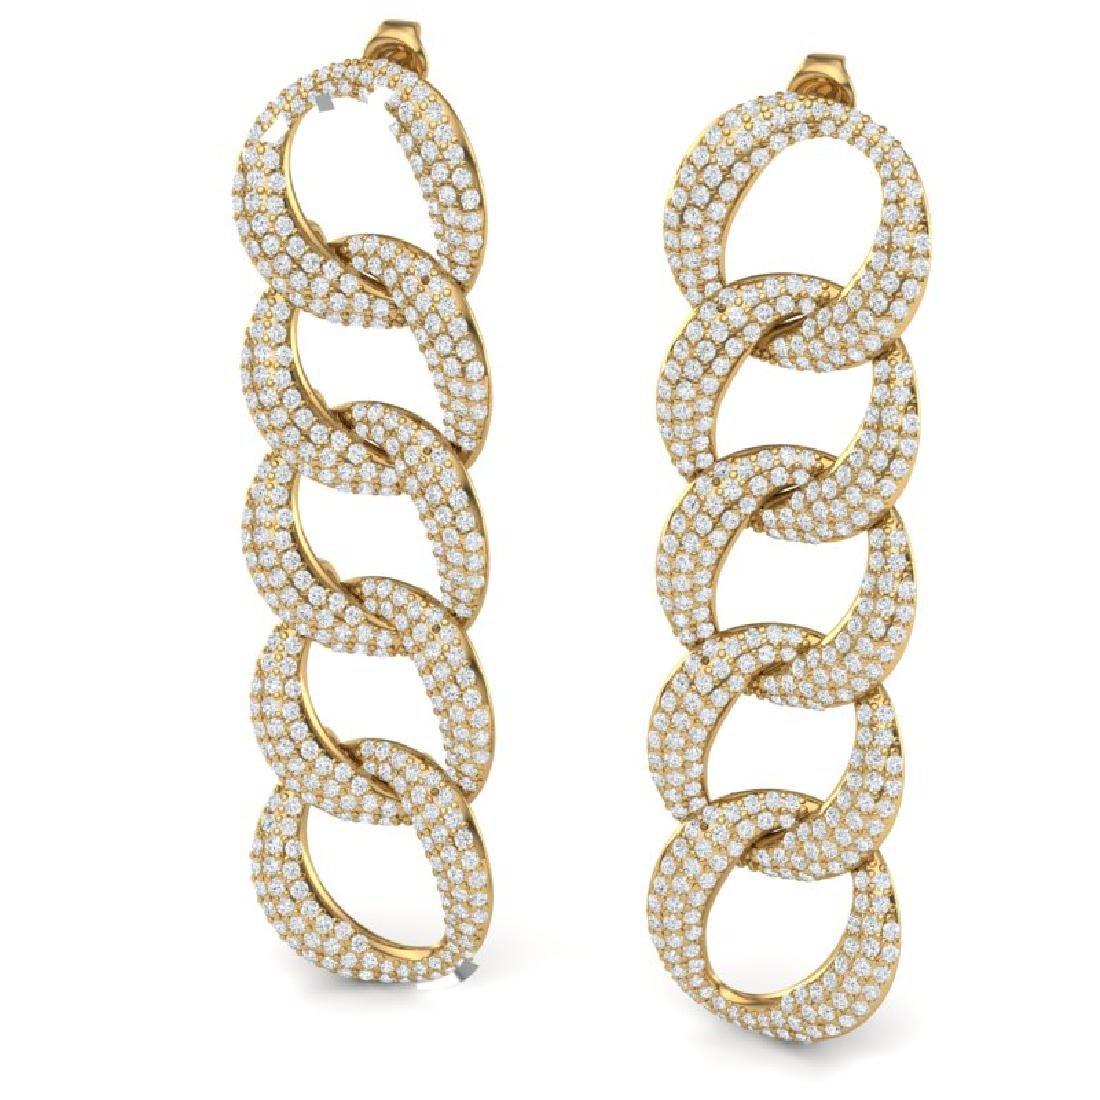 5 CTW Certified VS/SI Diamond Earrings 18K Yellow Gold - 2